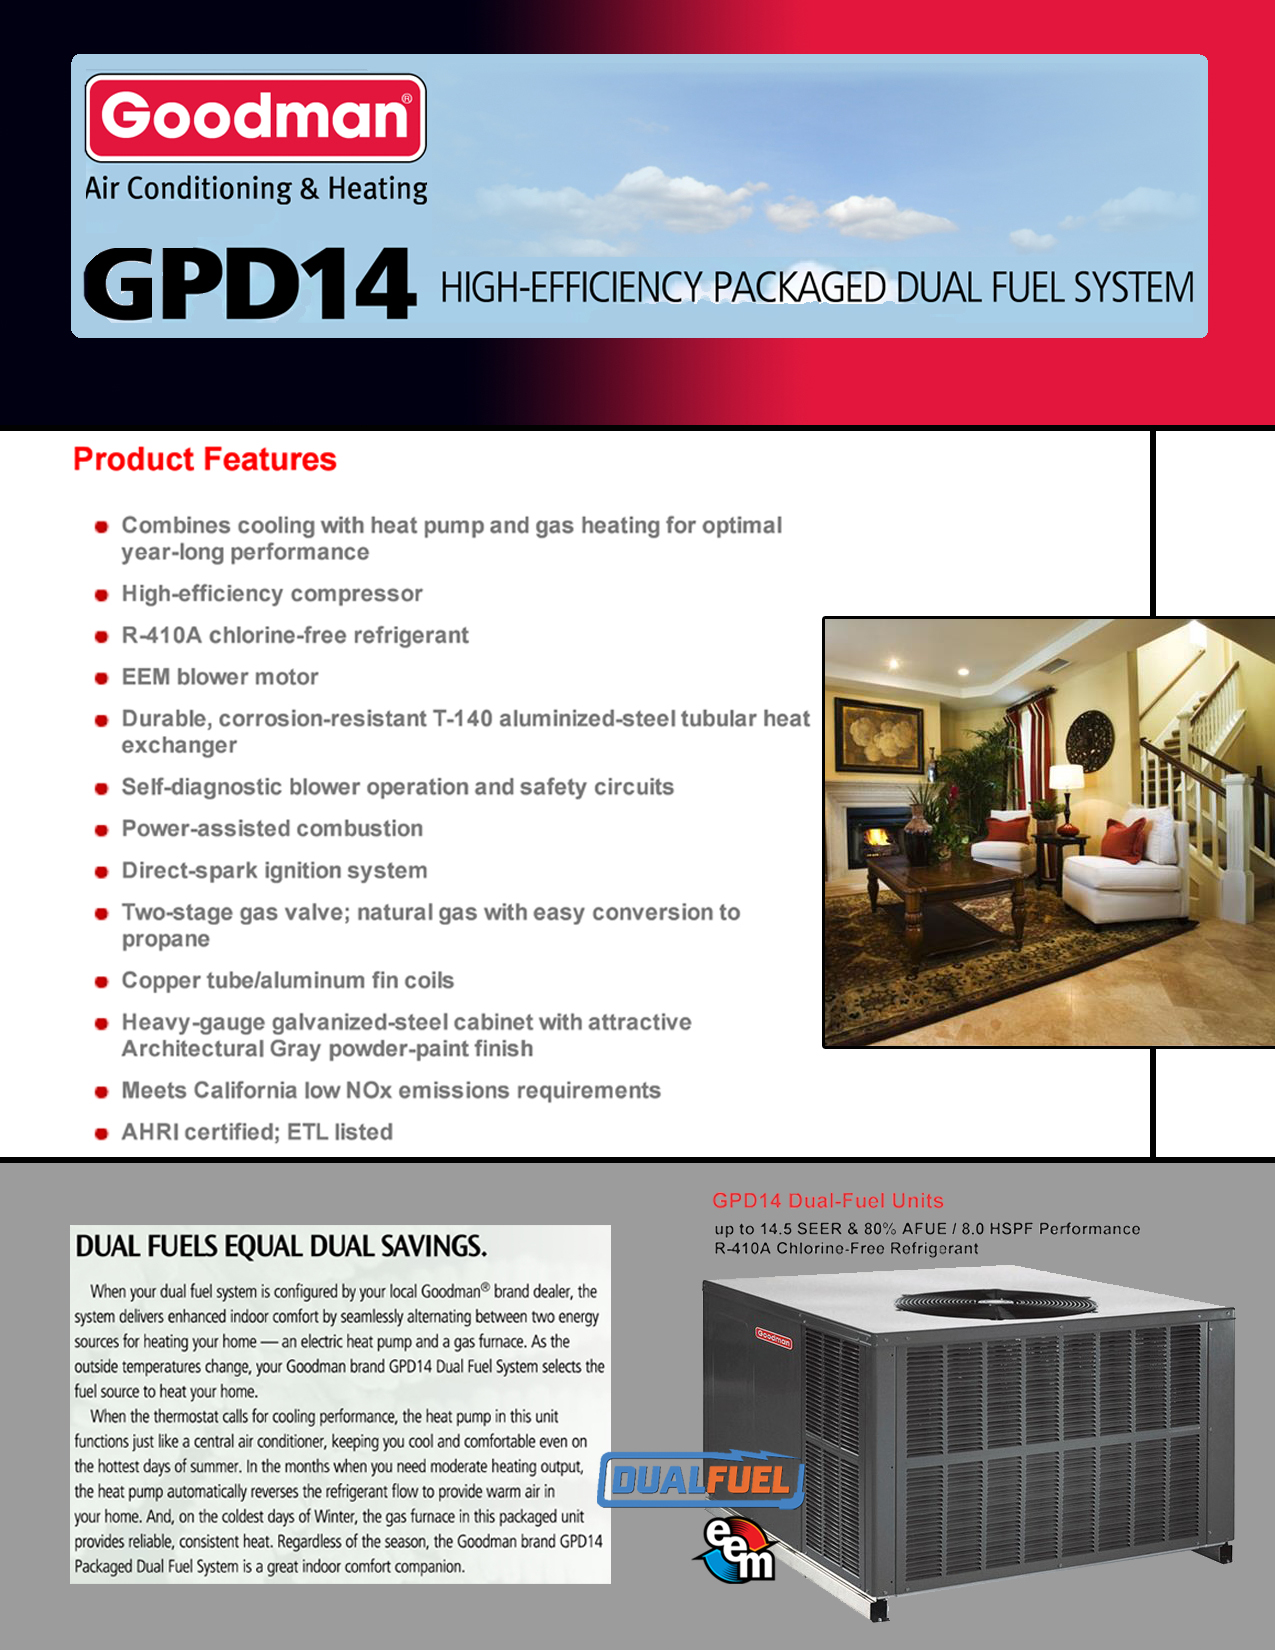 goodman 4 ton heat pump wiring diagram what is a grouped frequency 2 14 5 seer 60k btu gas package